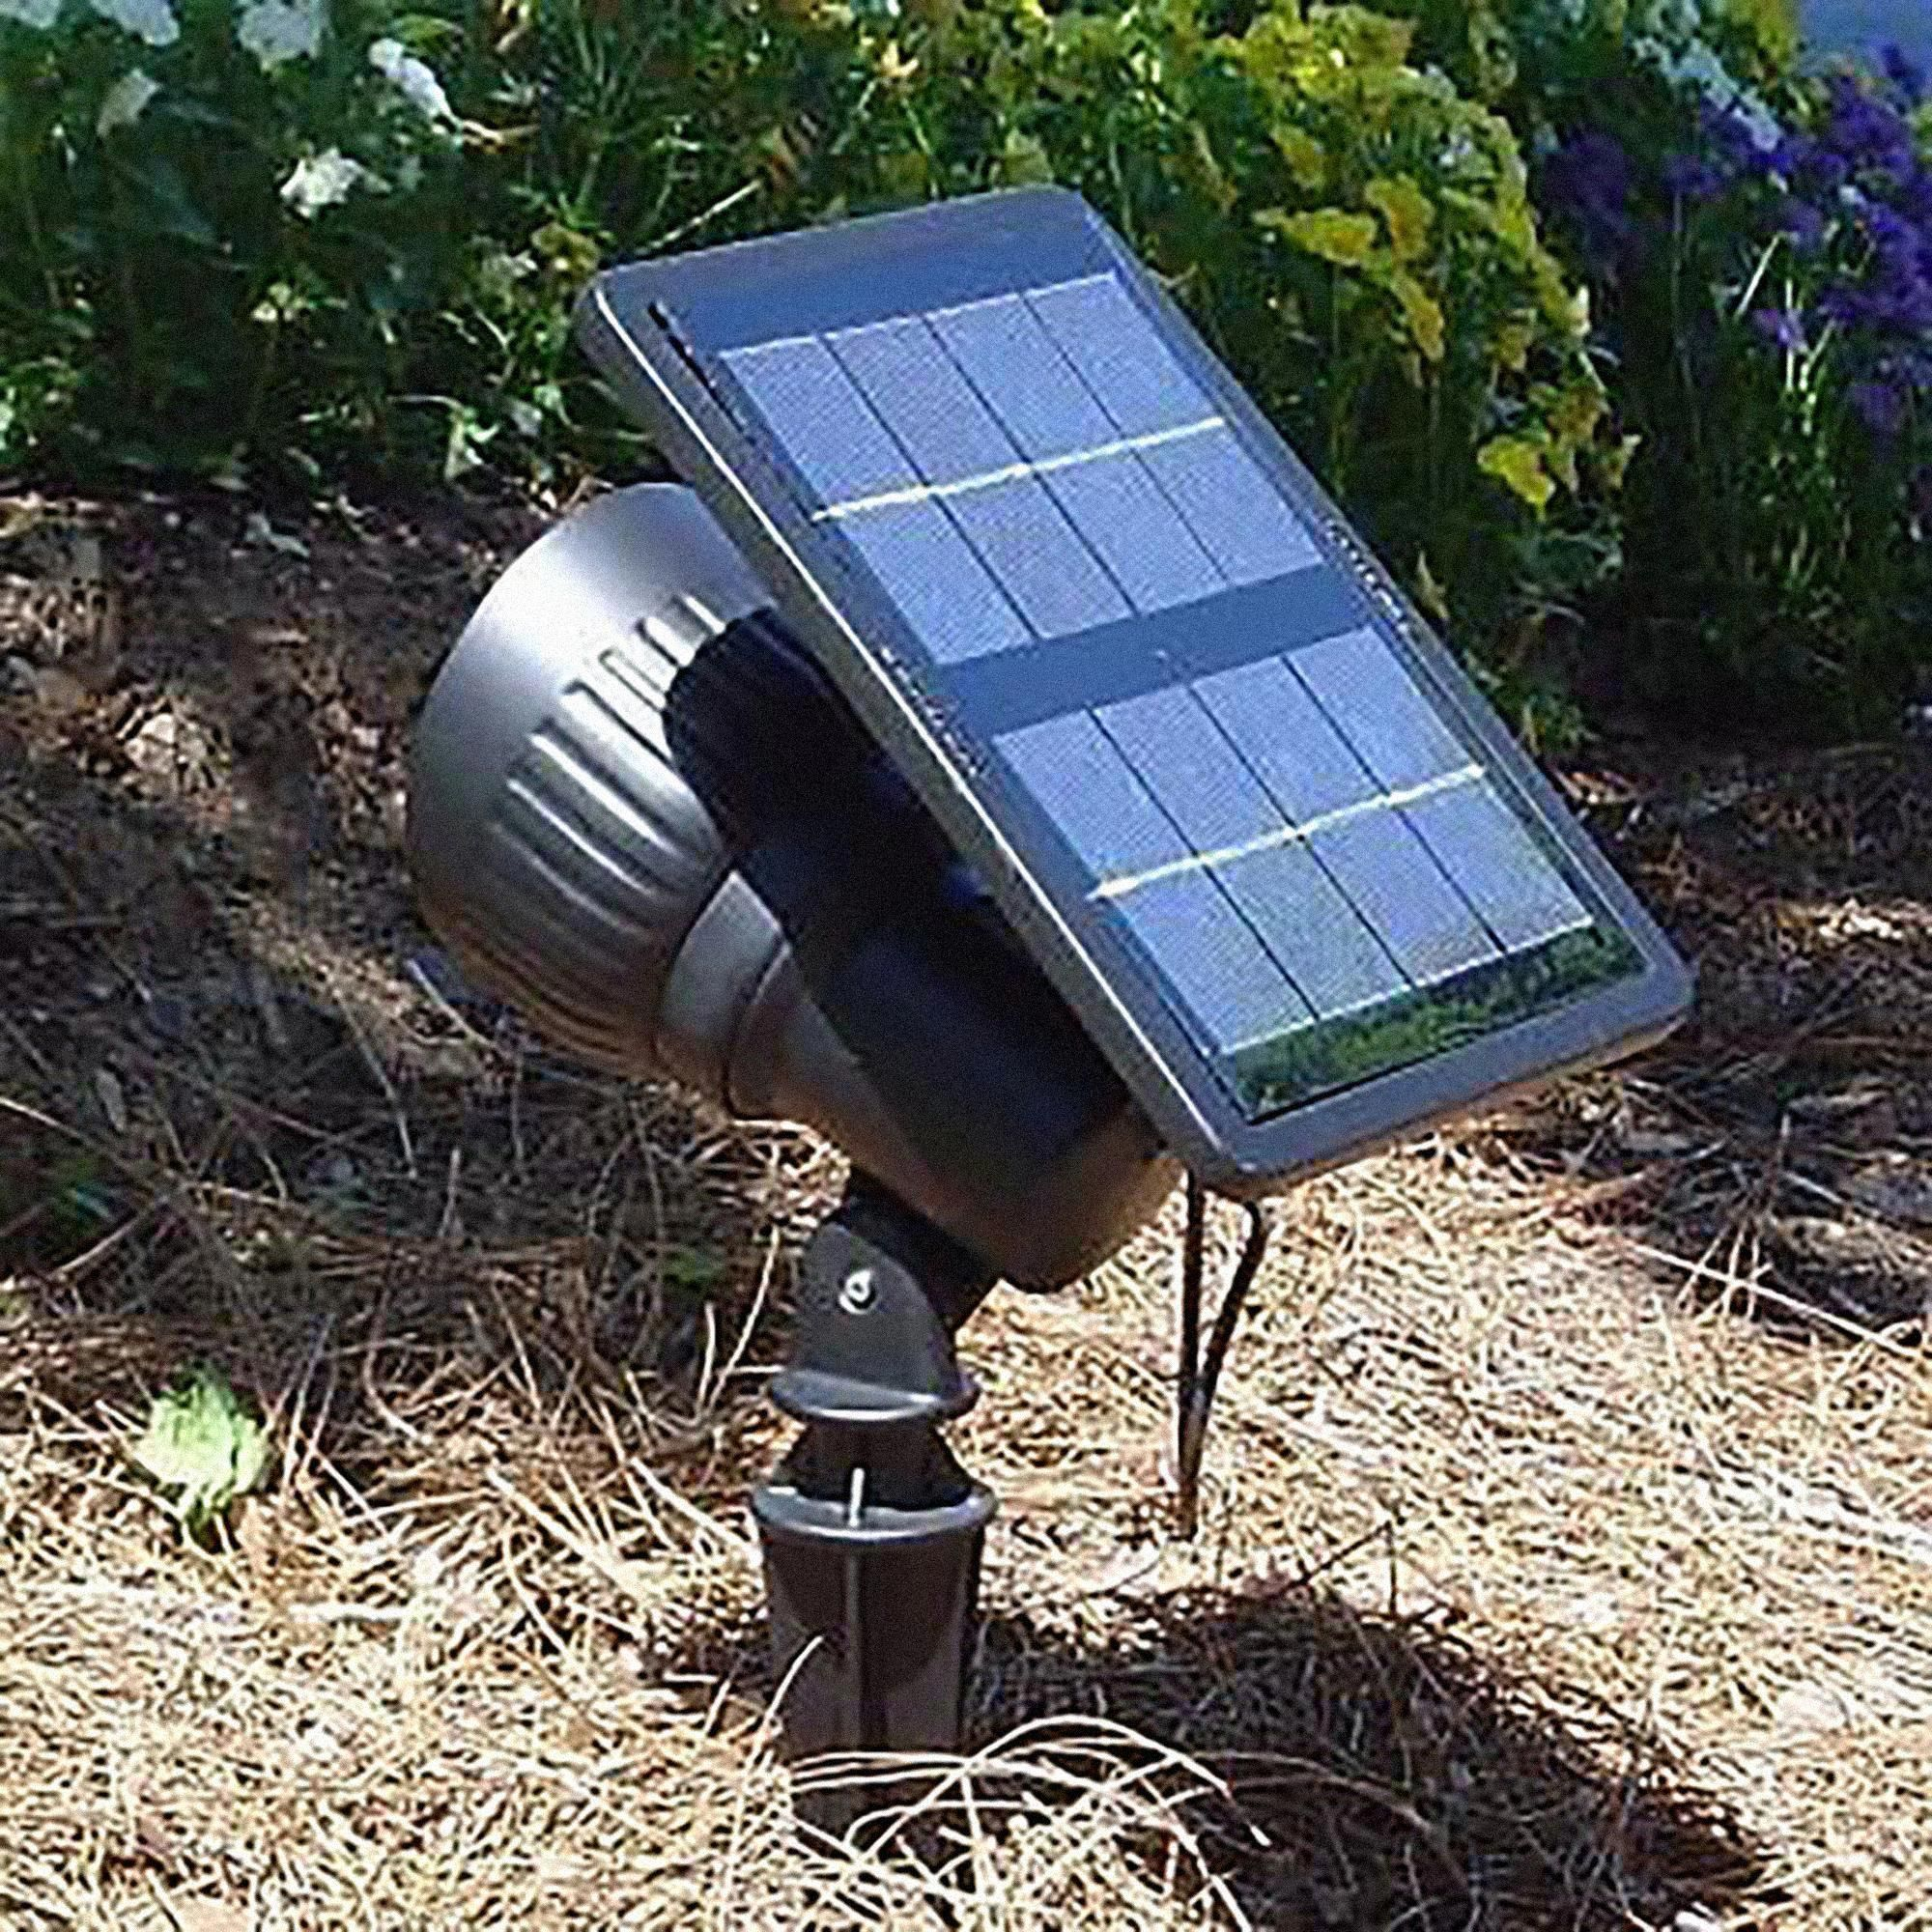 Progressive Solar Powered Led Spotlight Or Floodlight Landscapelighting Outdoorlightinglandscape Ga In 2020 Solar Spot Lights Solar Landscape Lighting Solar Lights